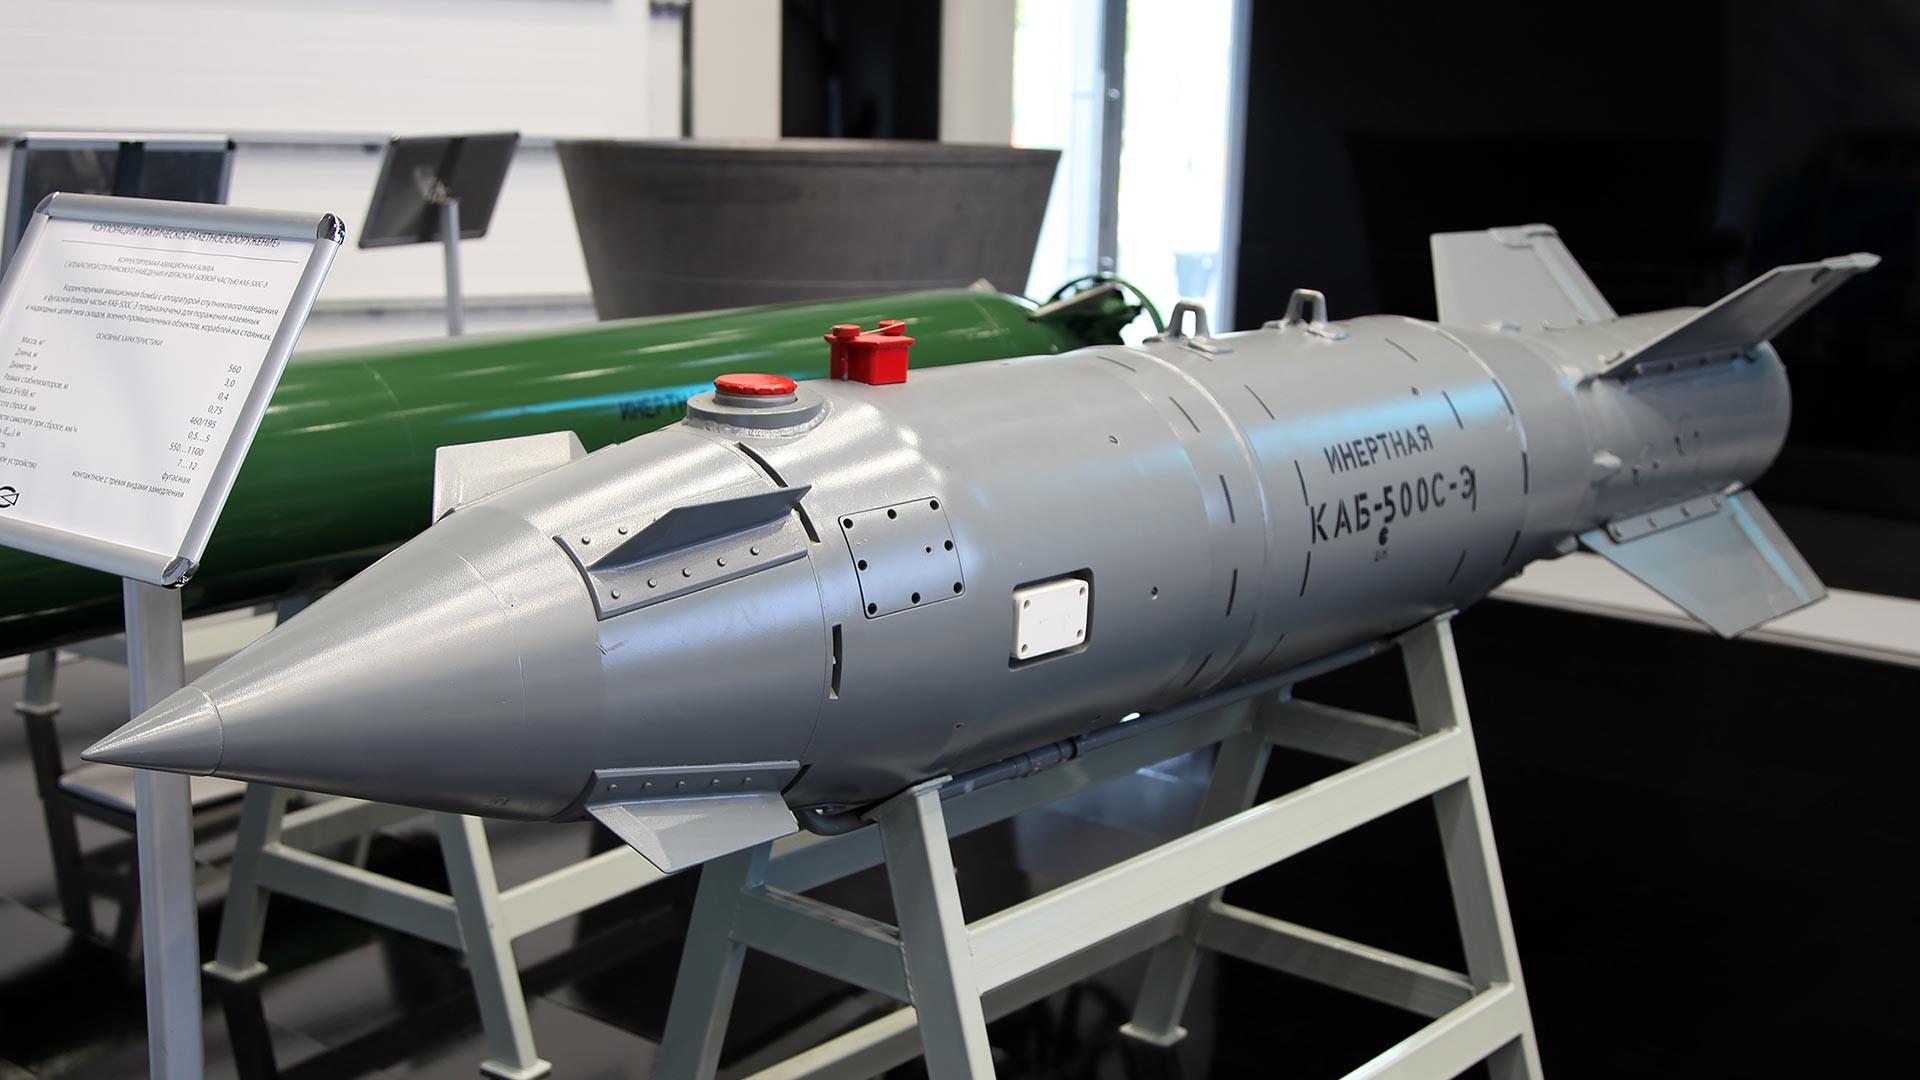 誘導爆弾KAB-500c